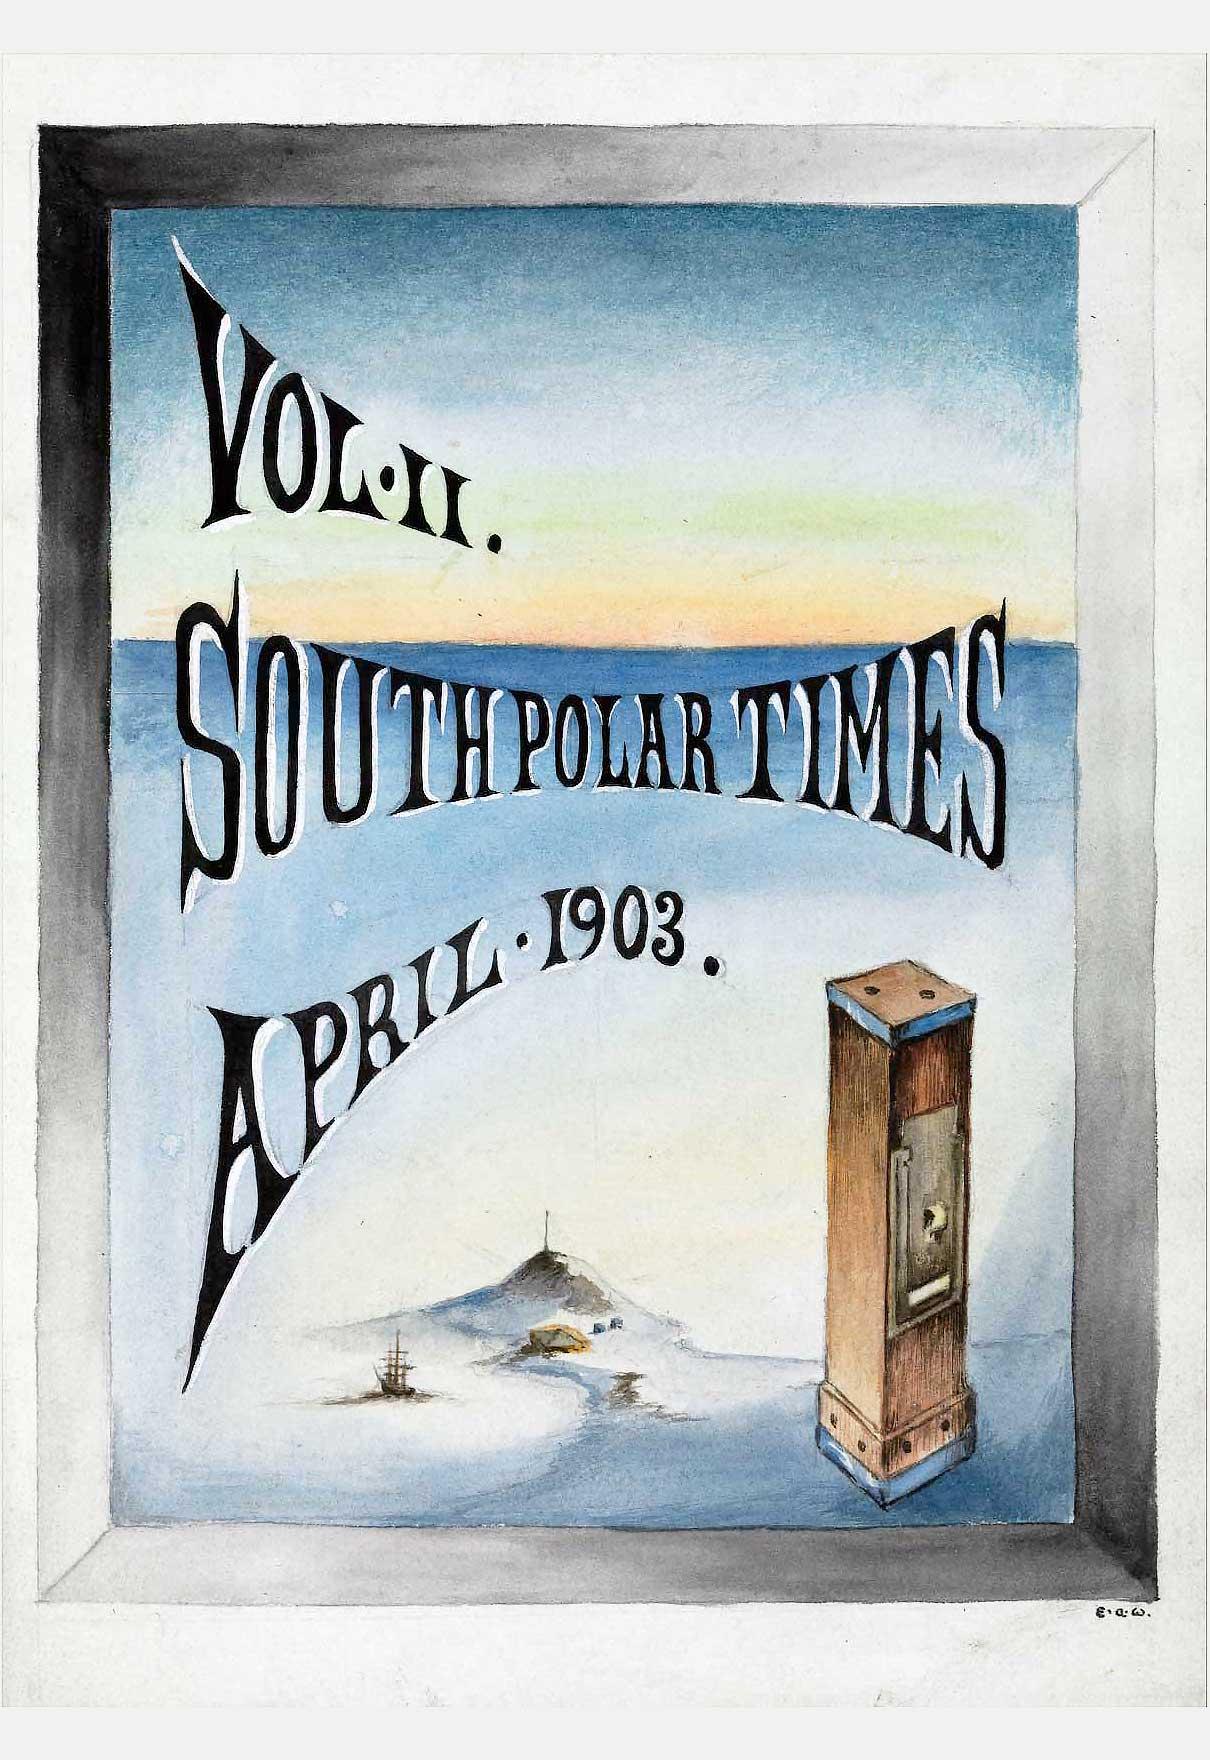 South Polar Times 5